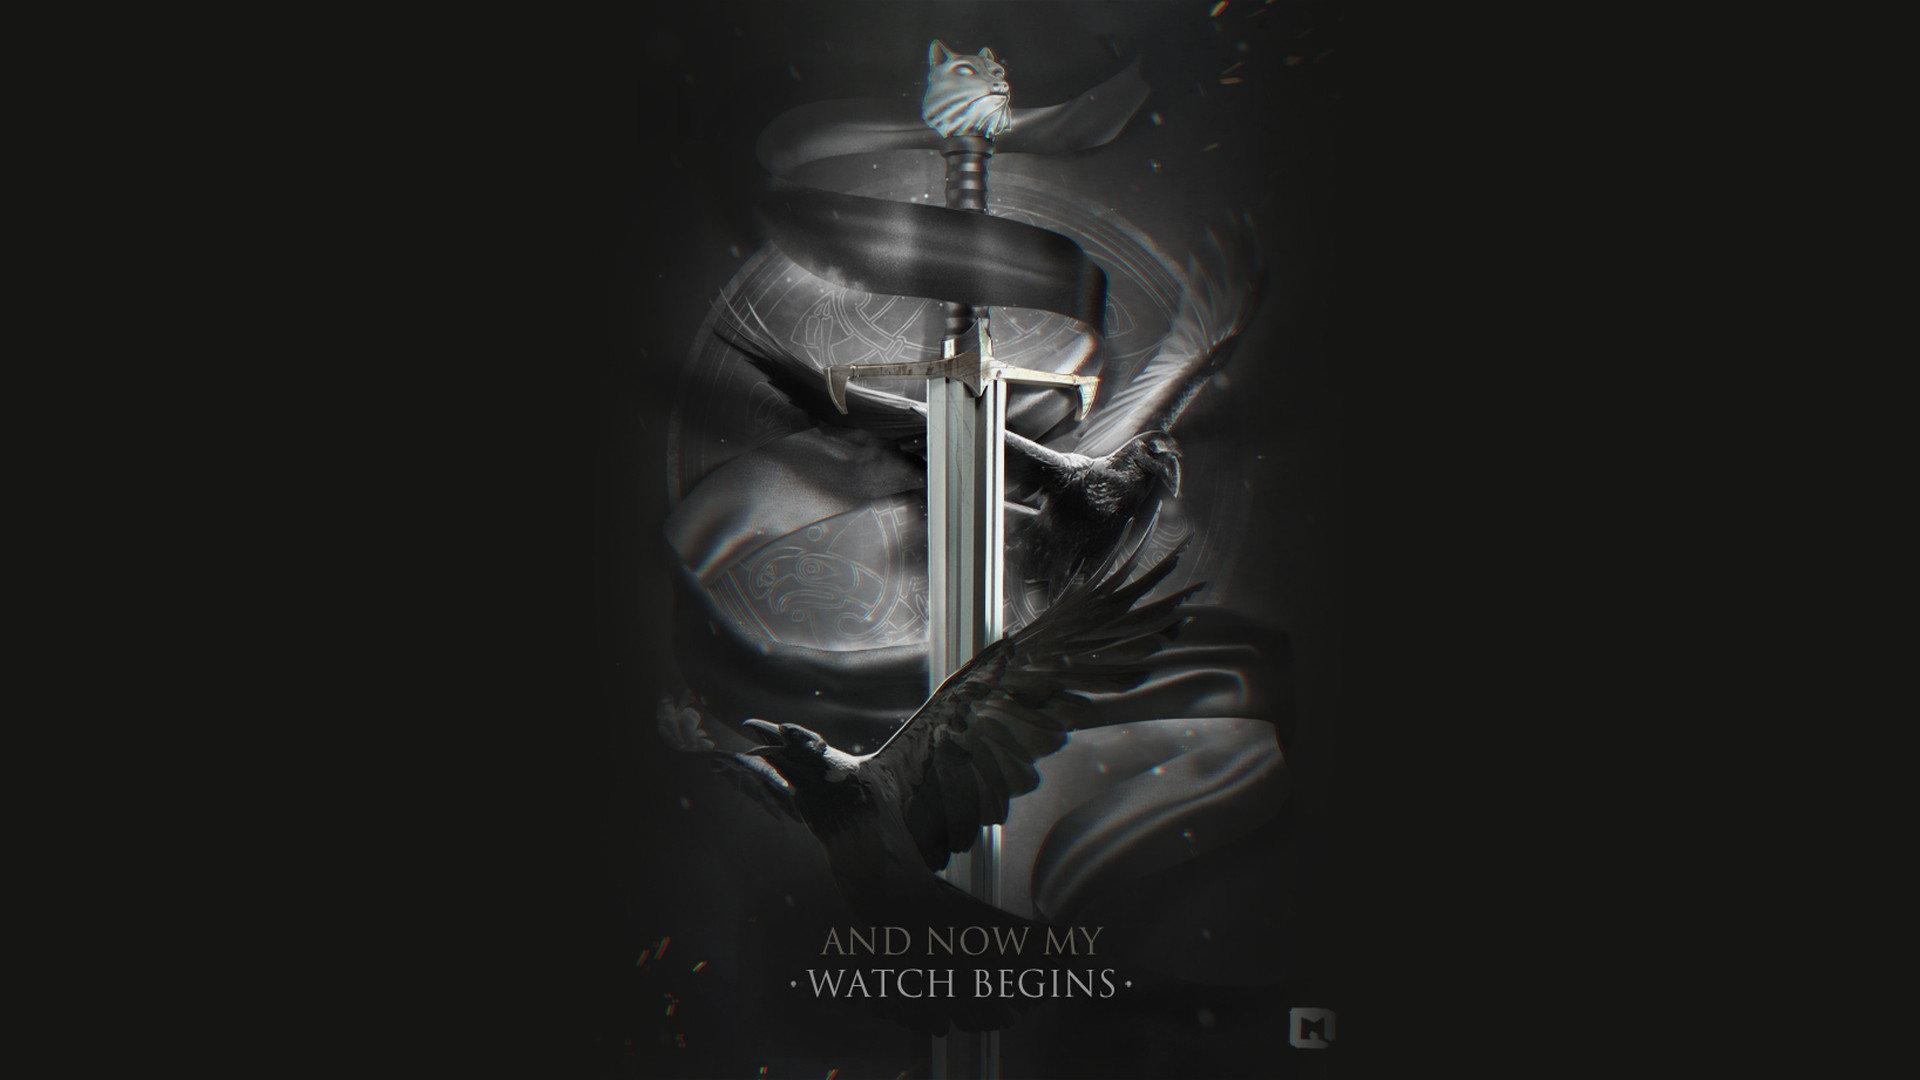 download hd 1080p game of thrones desktop wallpaper id:383421 for free